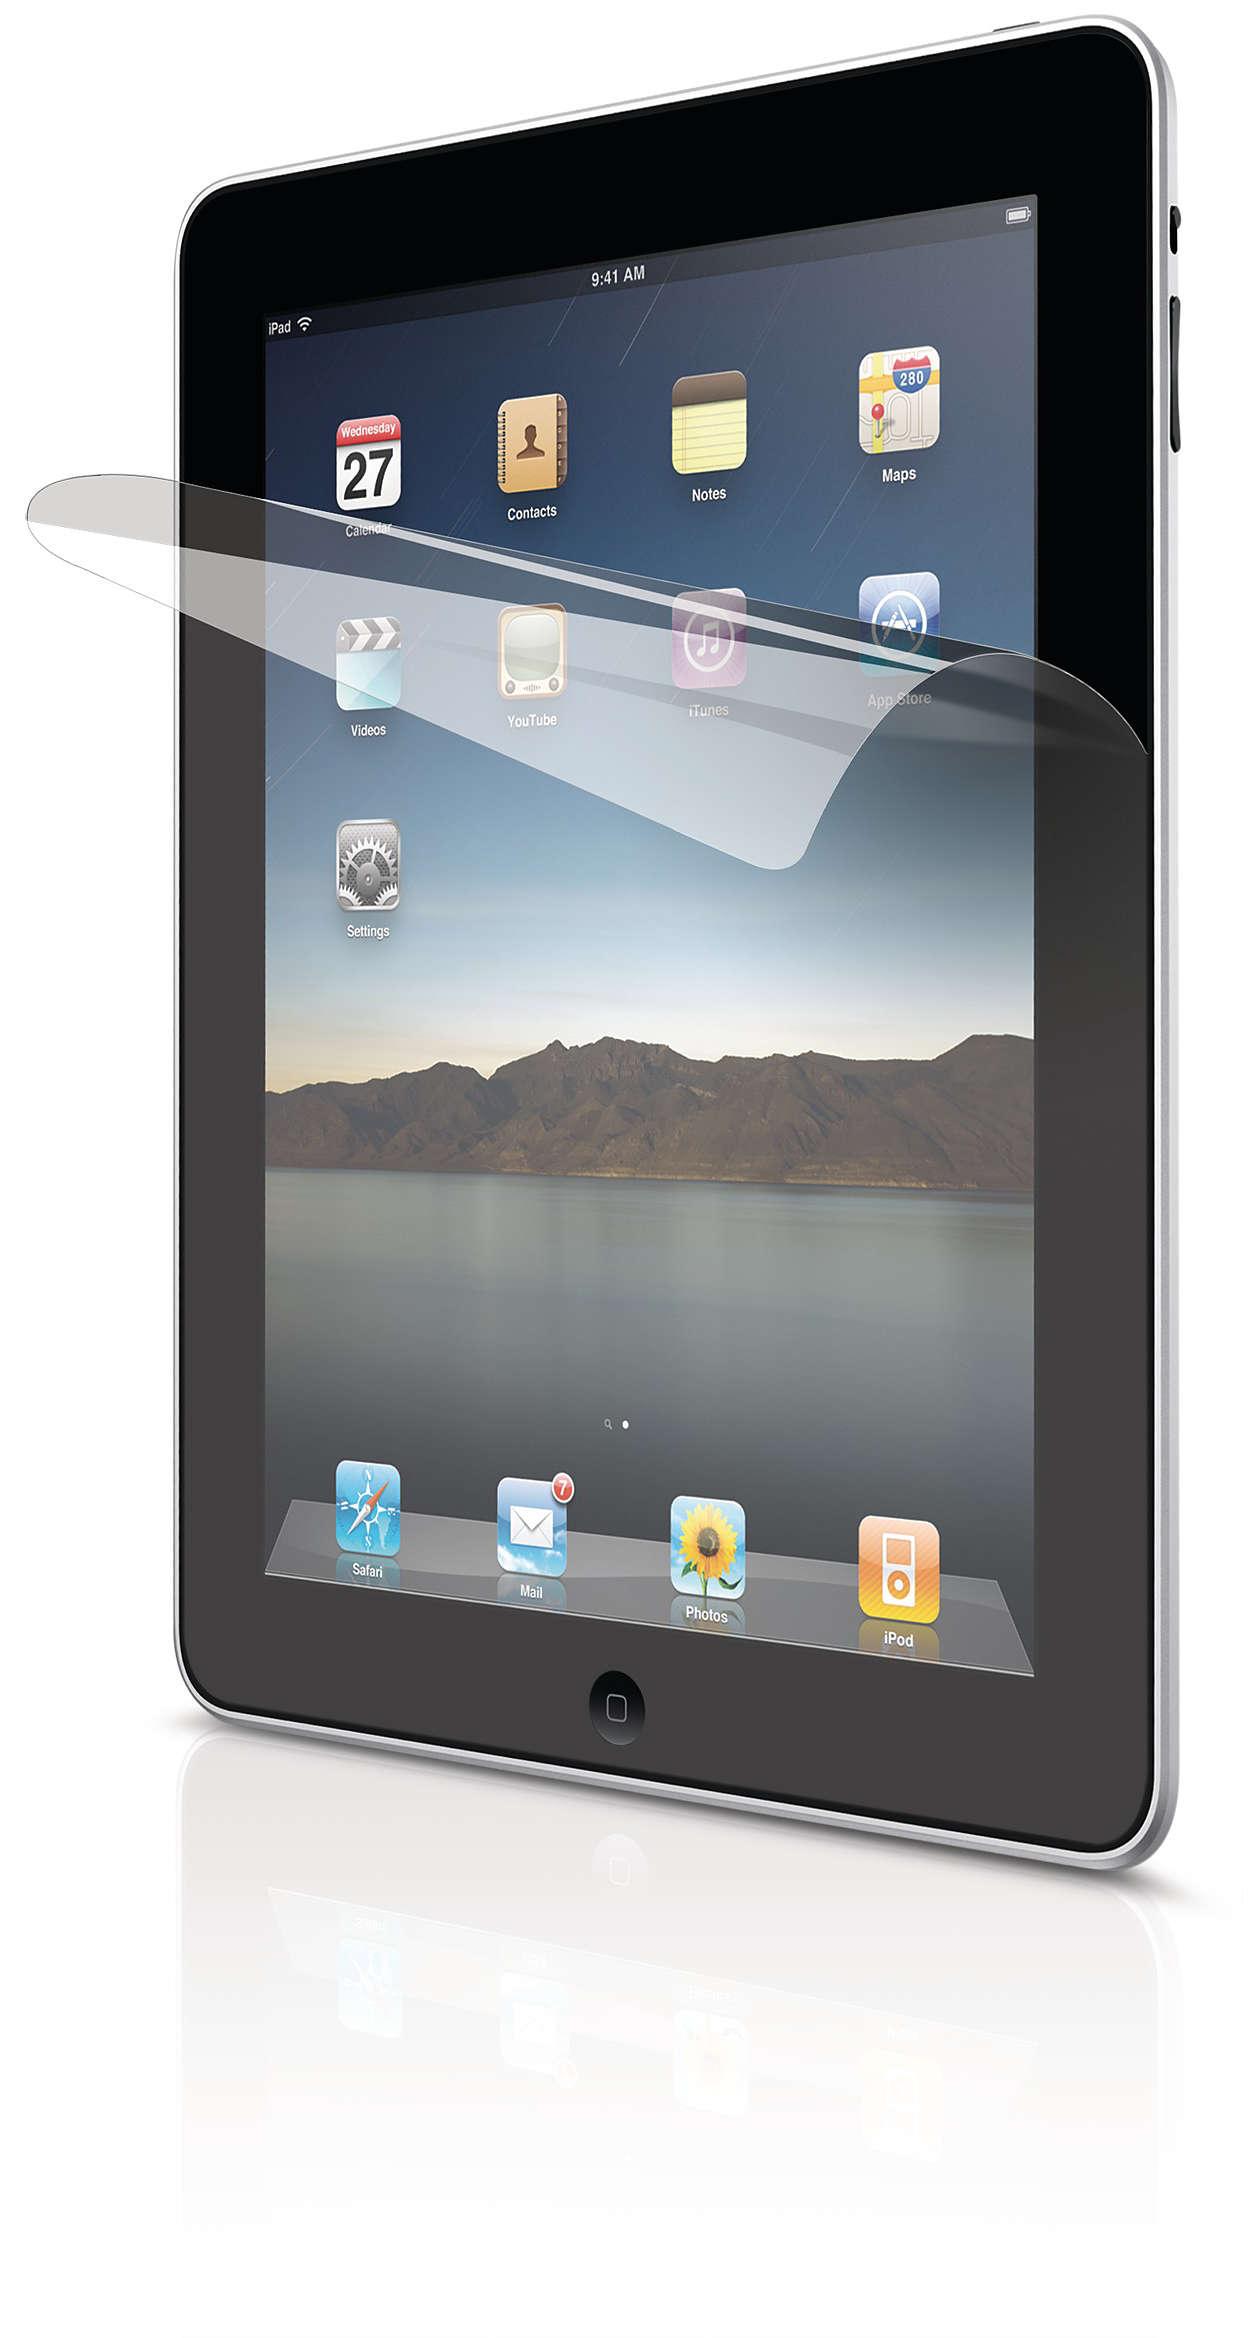 Skydda din iPad-skärm